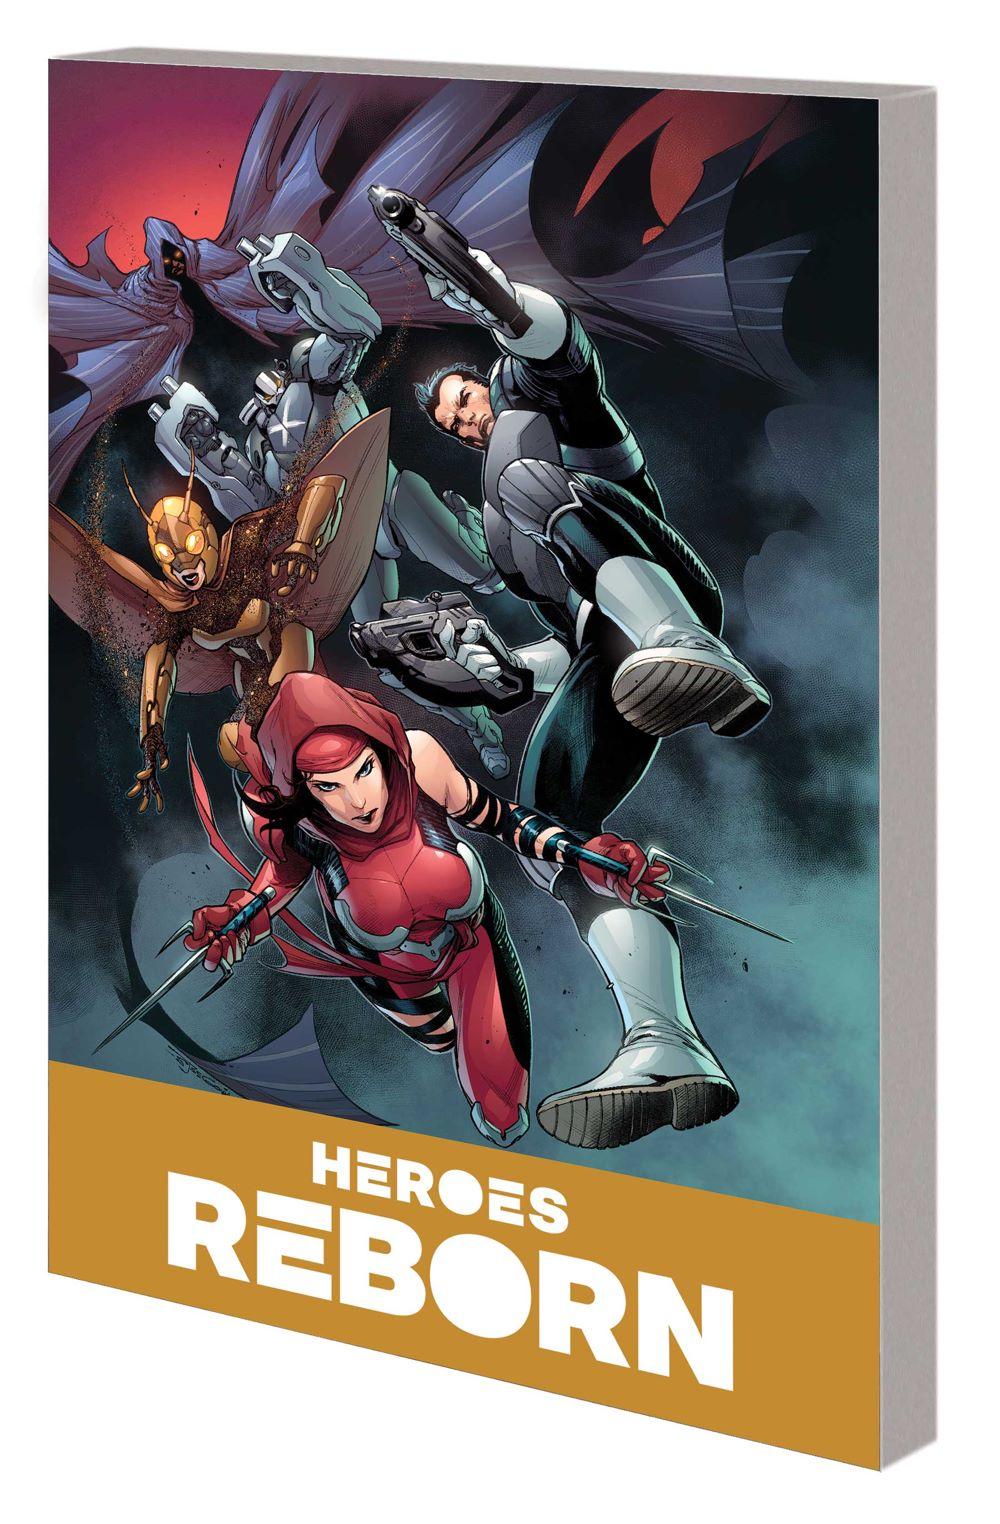 HEROES_REBORN_COMPANION_VOL_2_TPB Marvel Comics August 2021 Solicitations